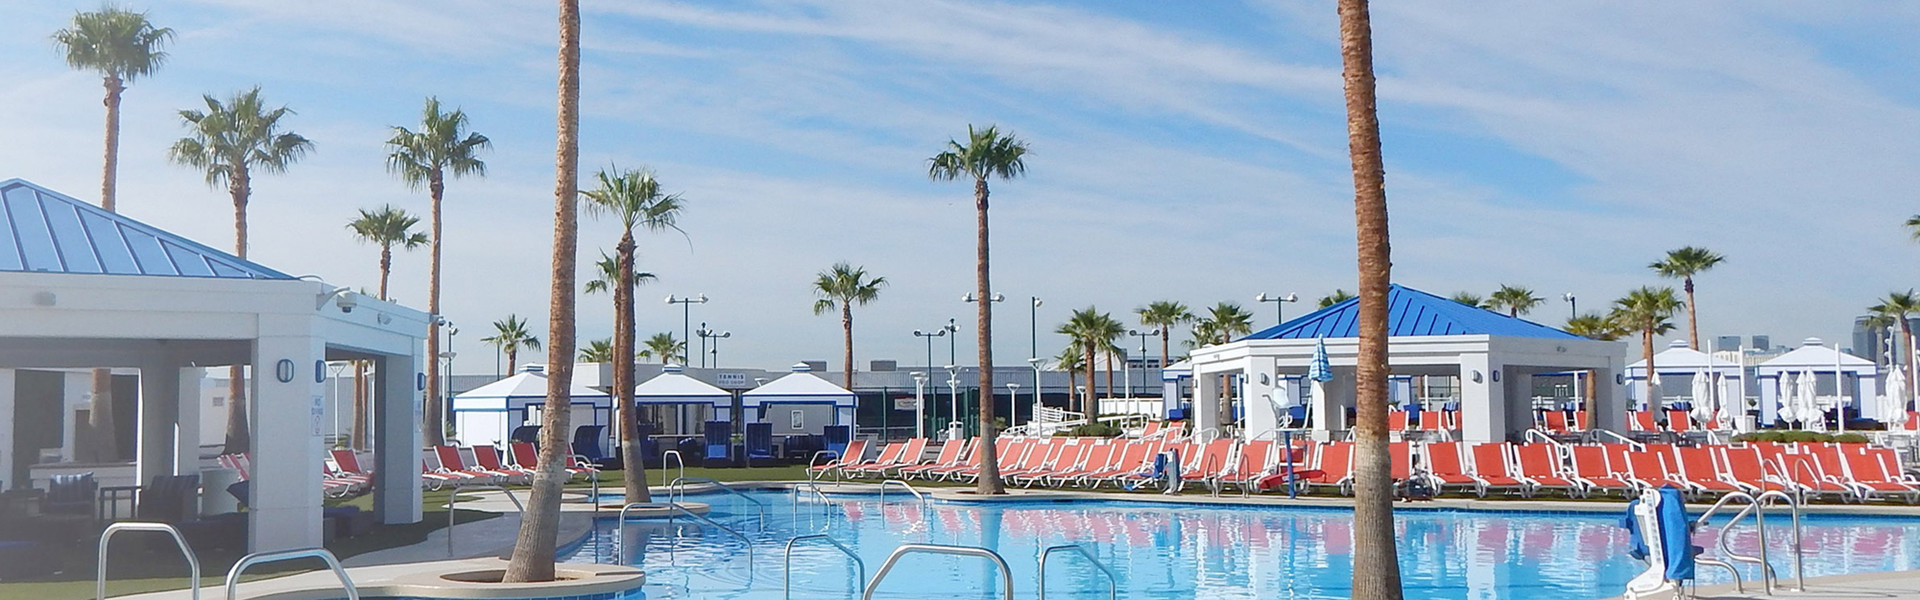 The Playground at Westgate Las Vegas Resort & Casino